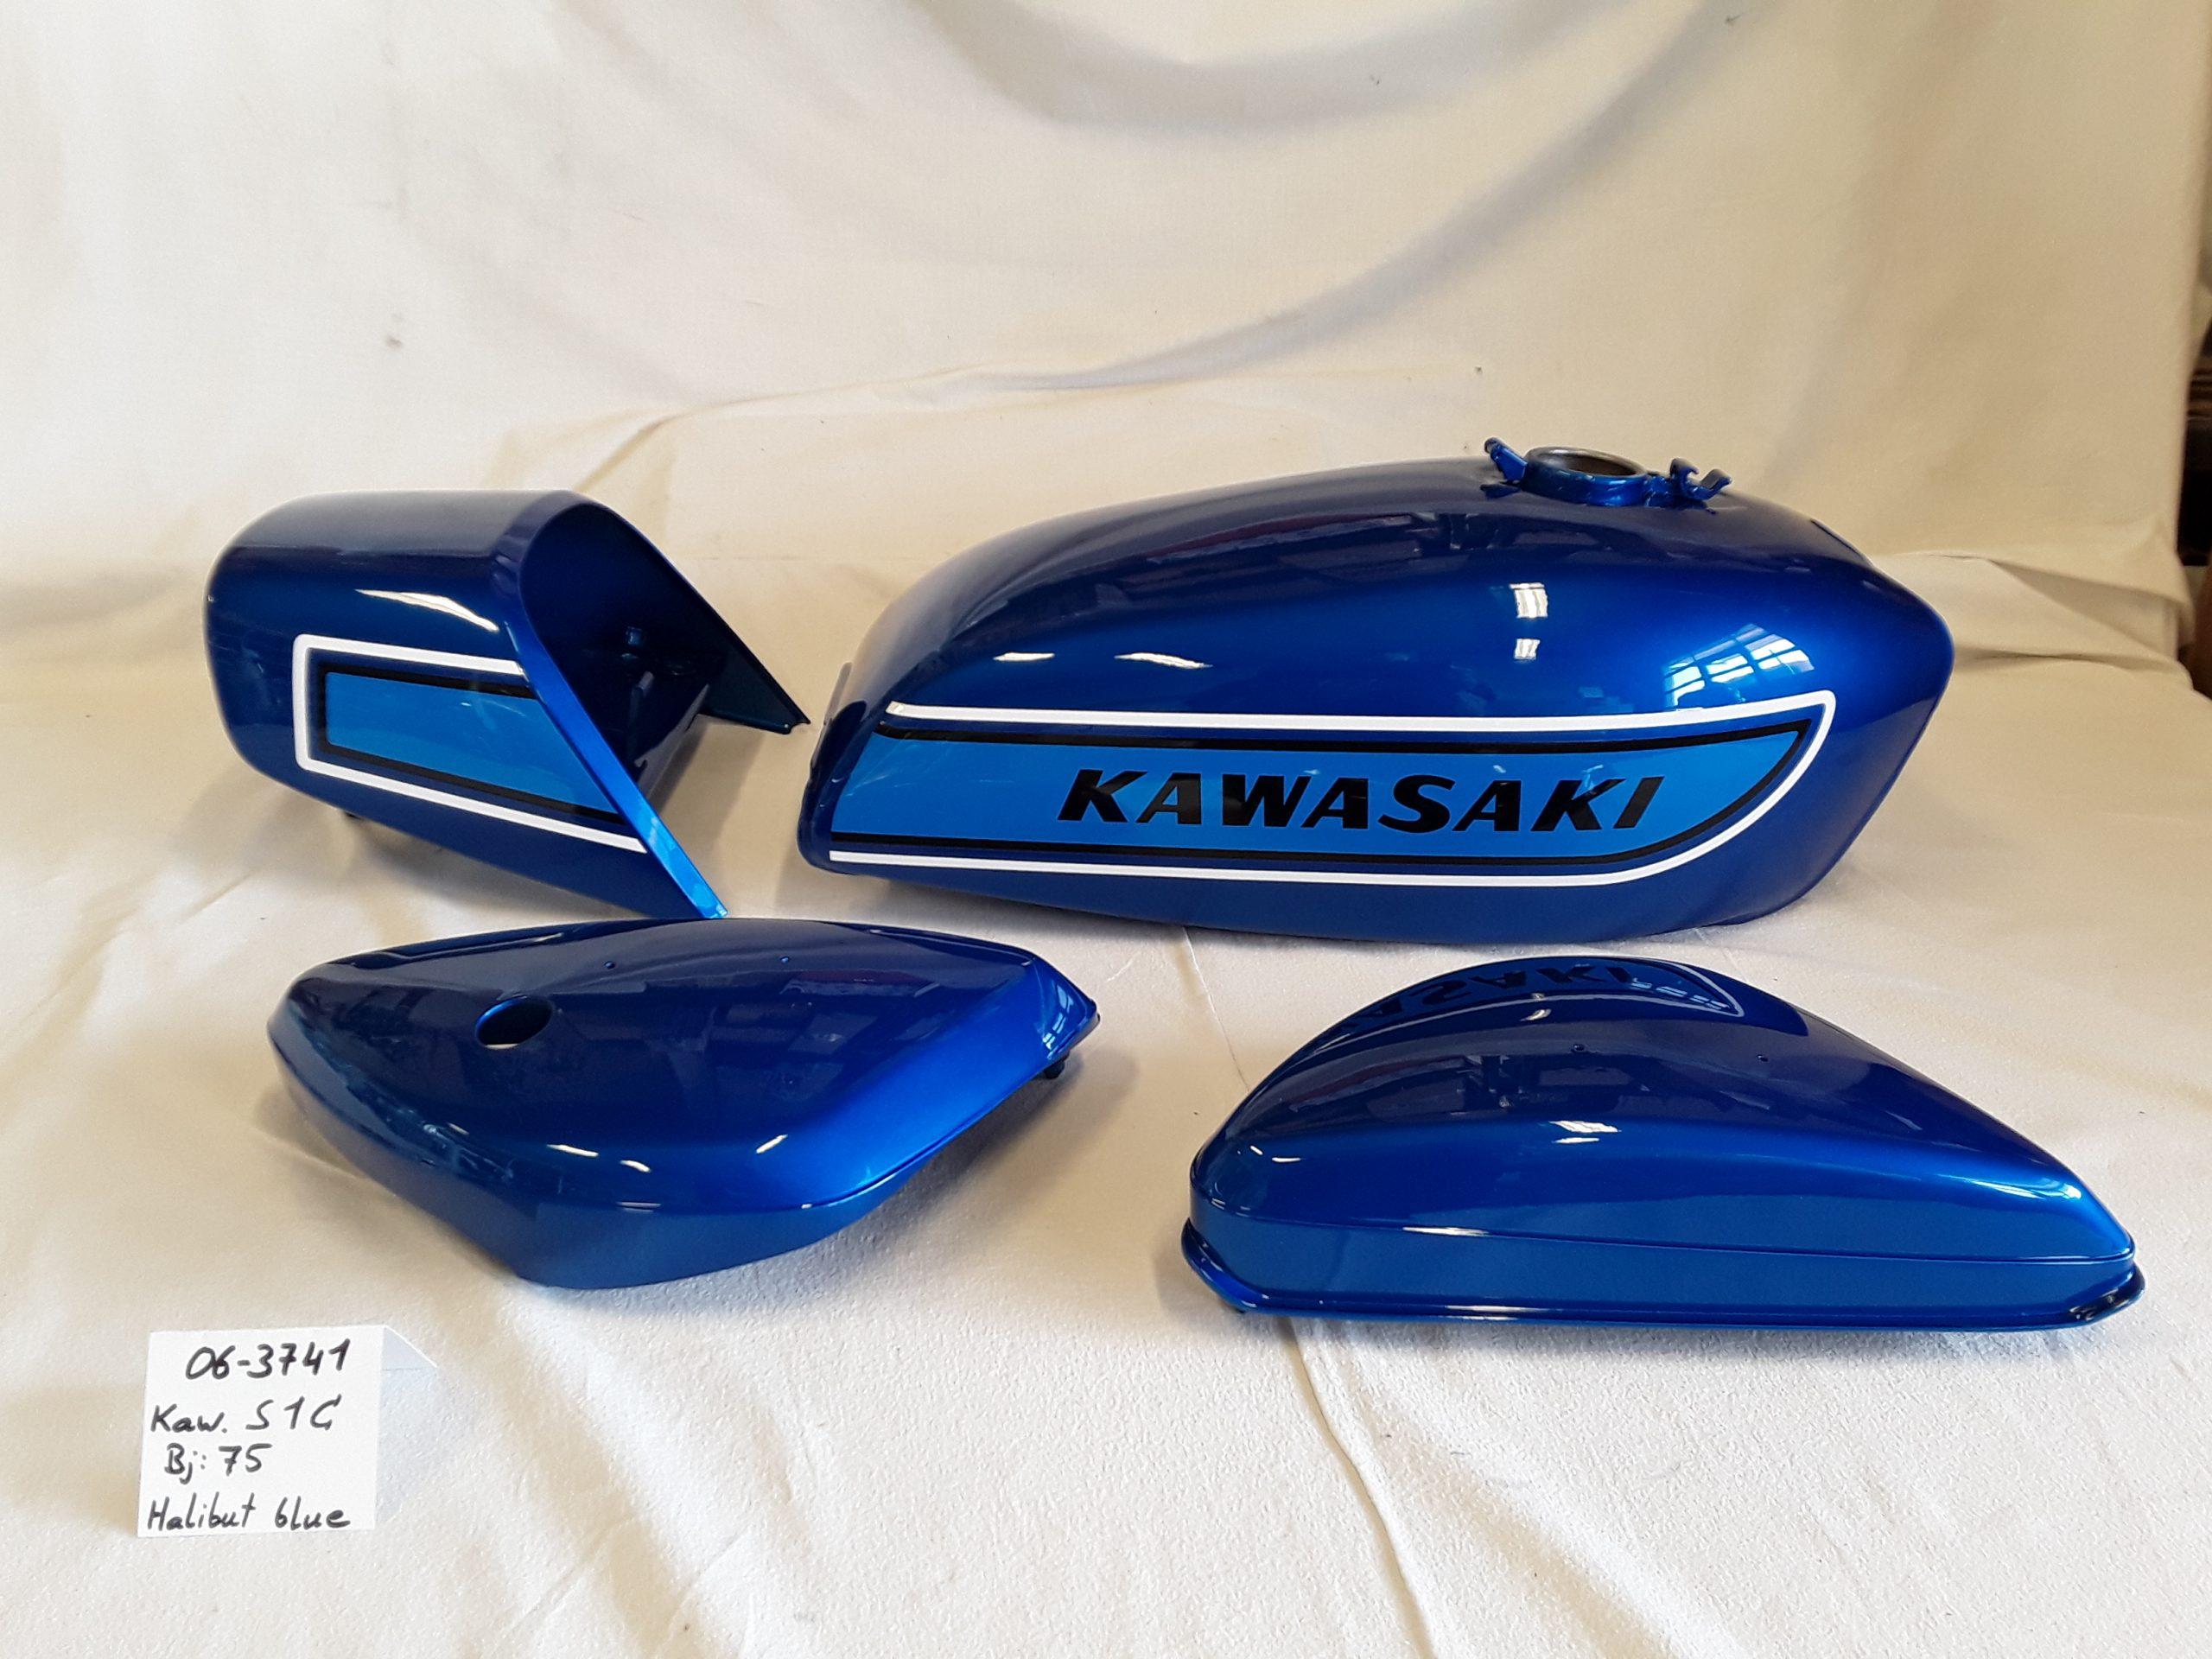 Kawasaki S1C Bj.1975 in halibut blue RH-Lacke Lackiererei Motorradlackierung 06-3741